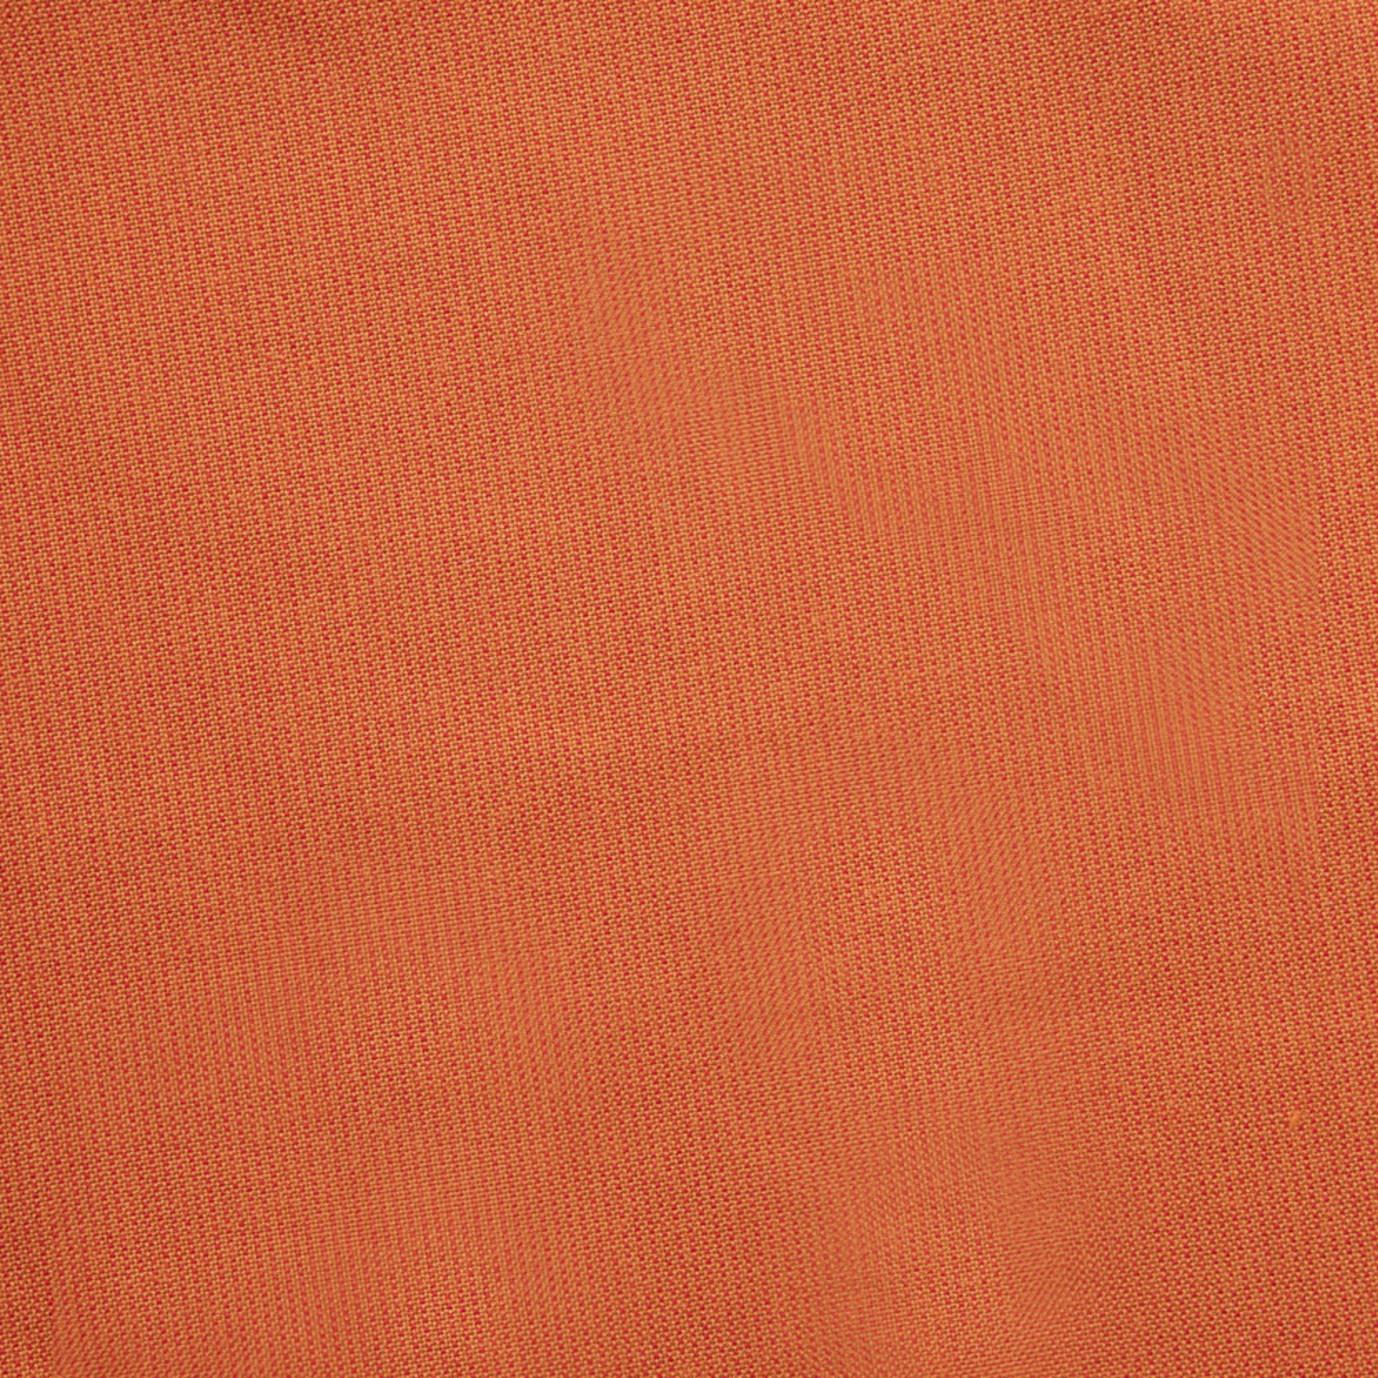 Deco™ Club Ottomans - Tikka Orange